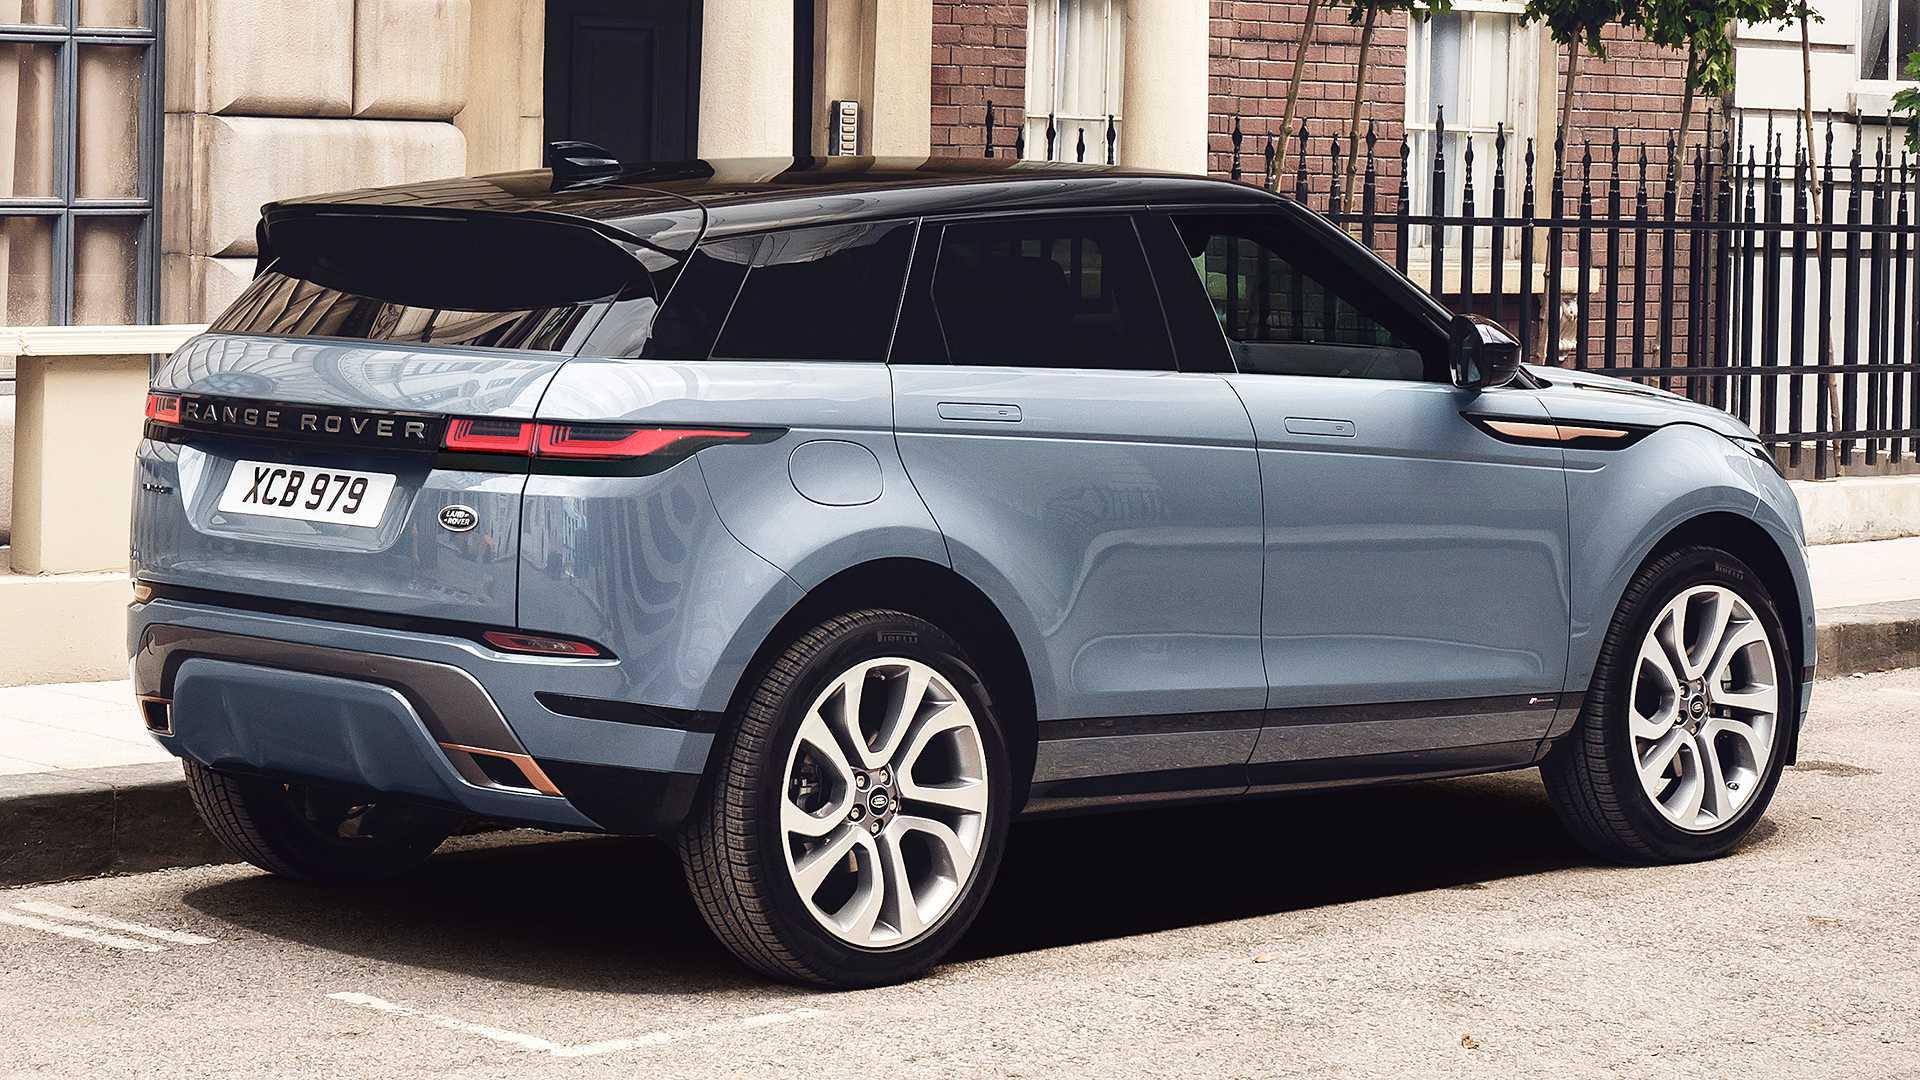 2020-range-rover-evoque (61)